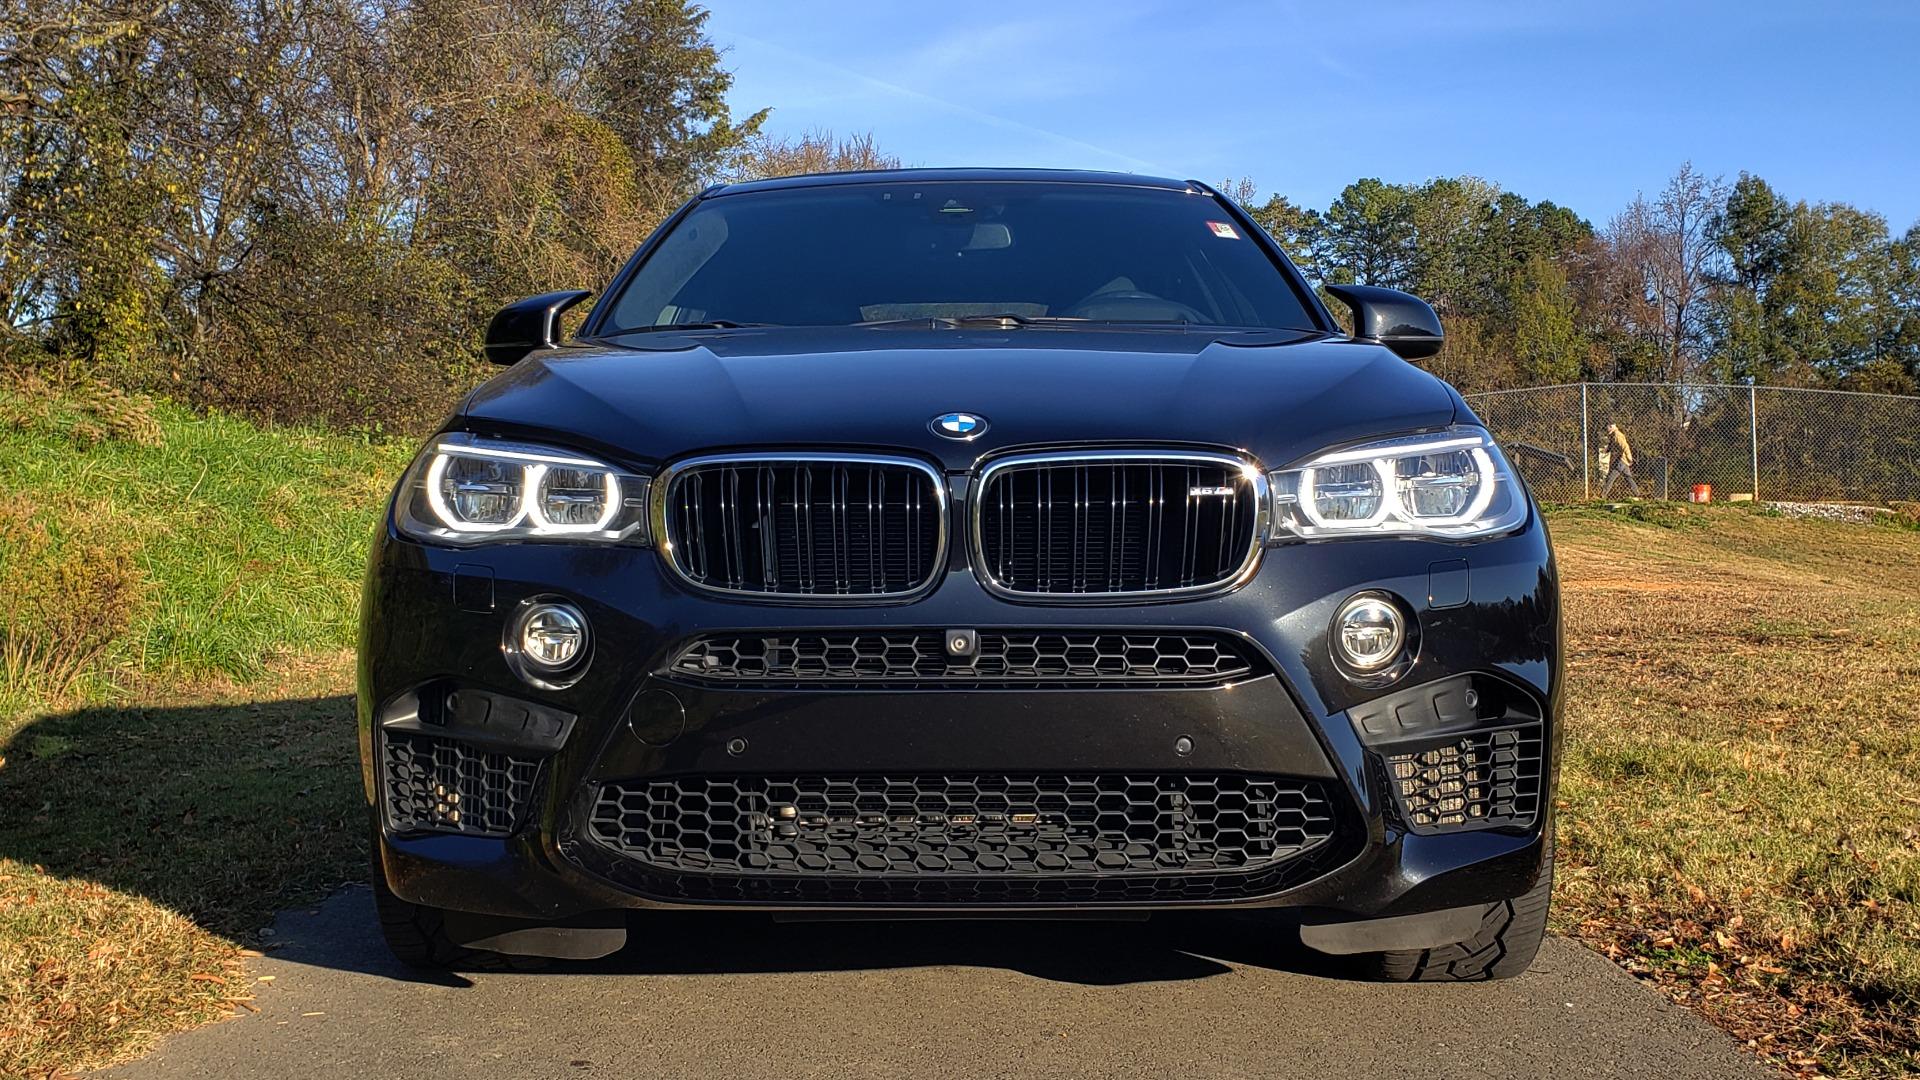 Used 2016 BMW X6 M EXEC PKG / DRVR ASST / NAV / SUNROOF / BLIND SPOT / REARVIEW for sale Sold at Formula Imports in Charlotte NC 28227 11